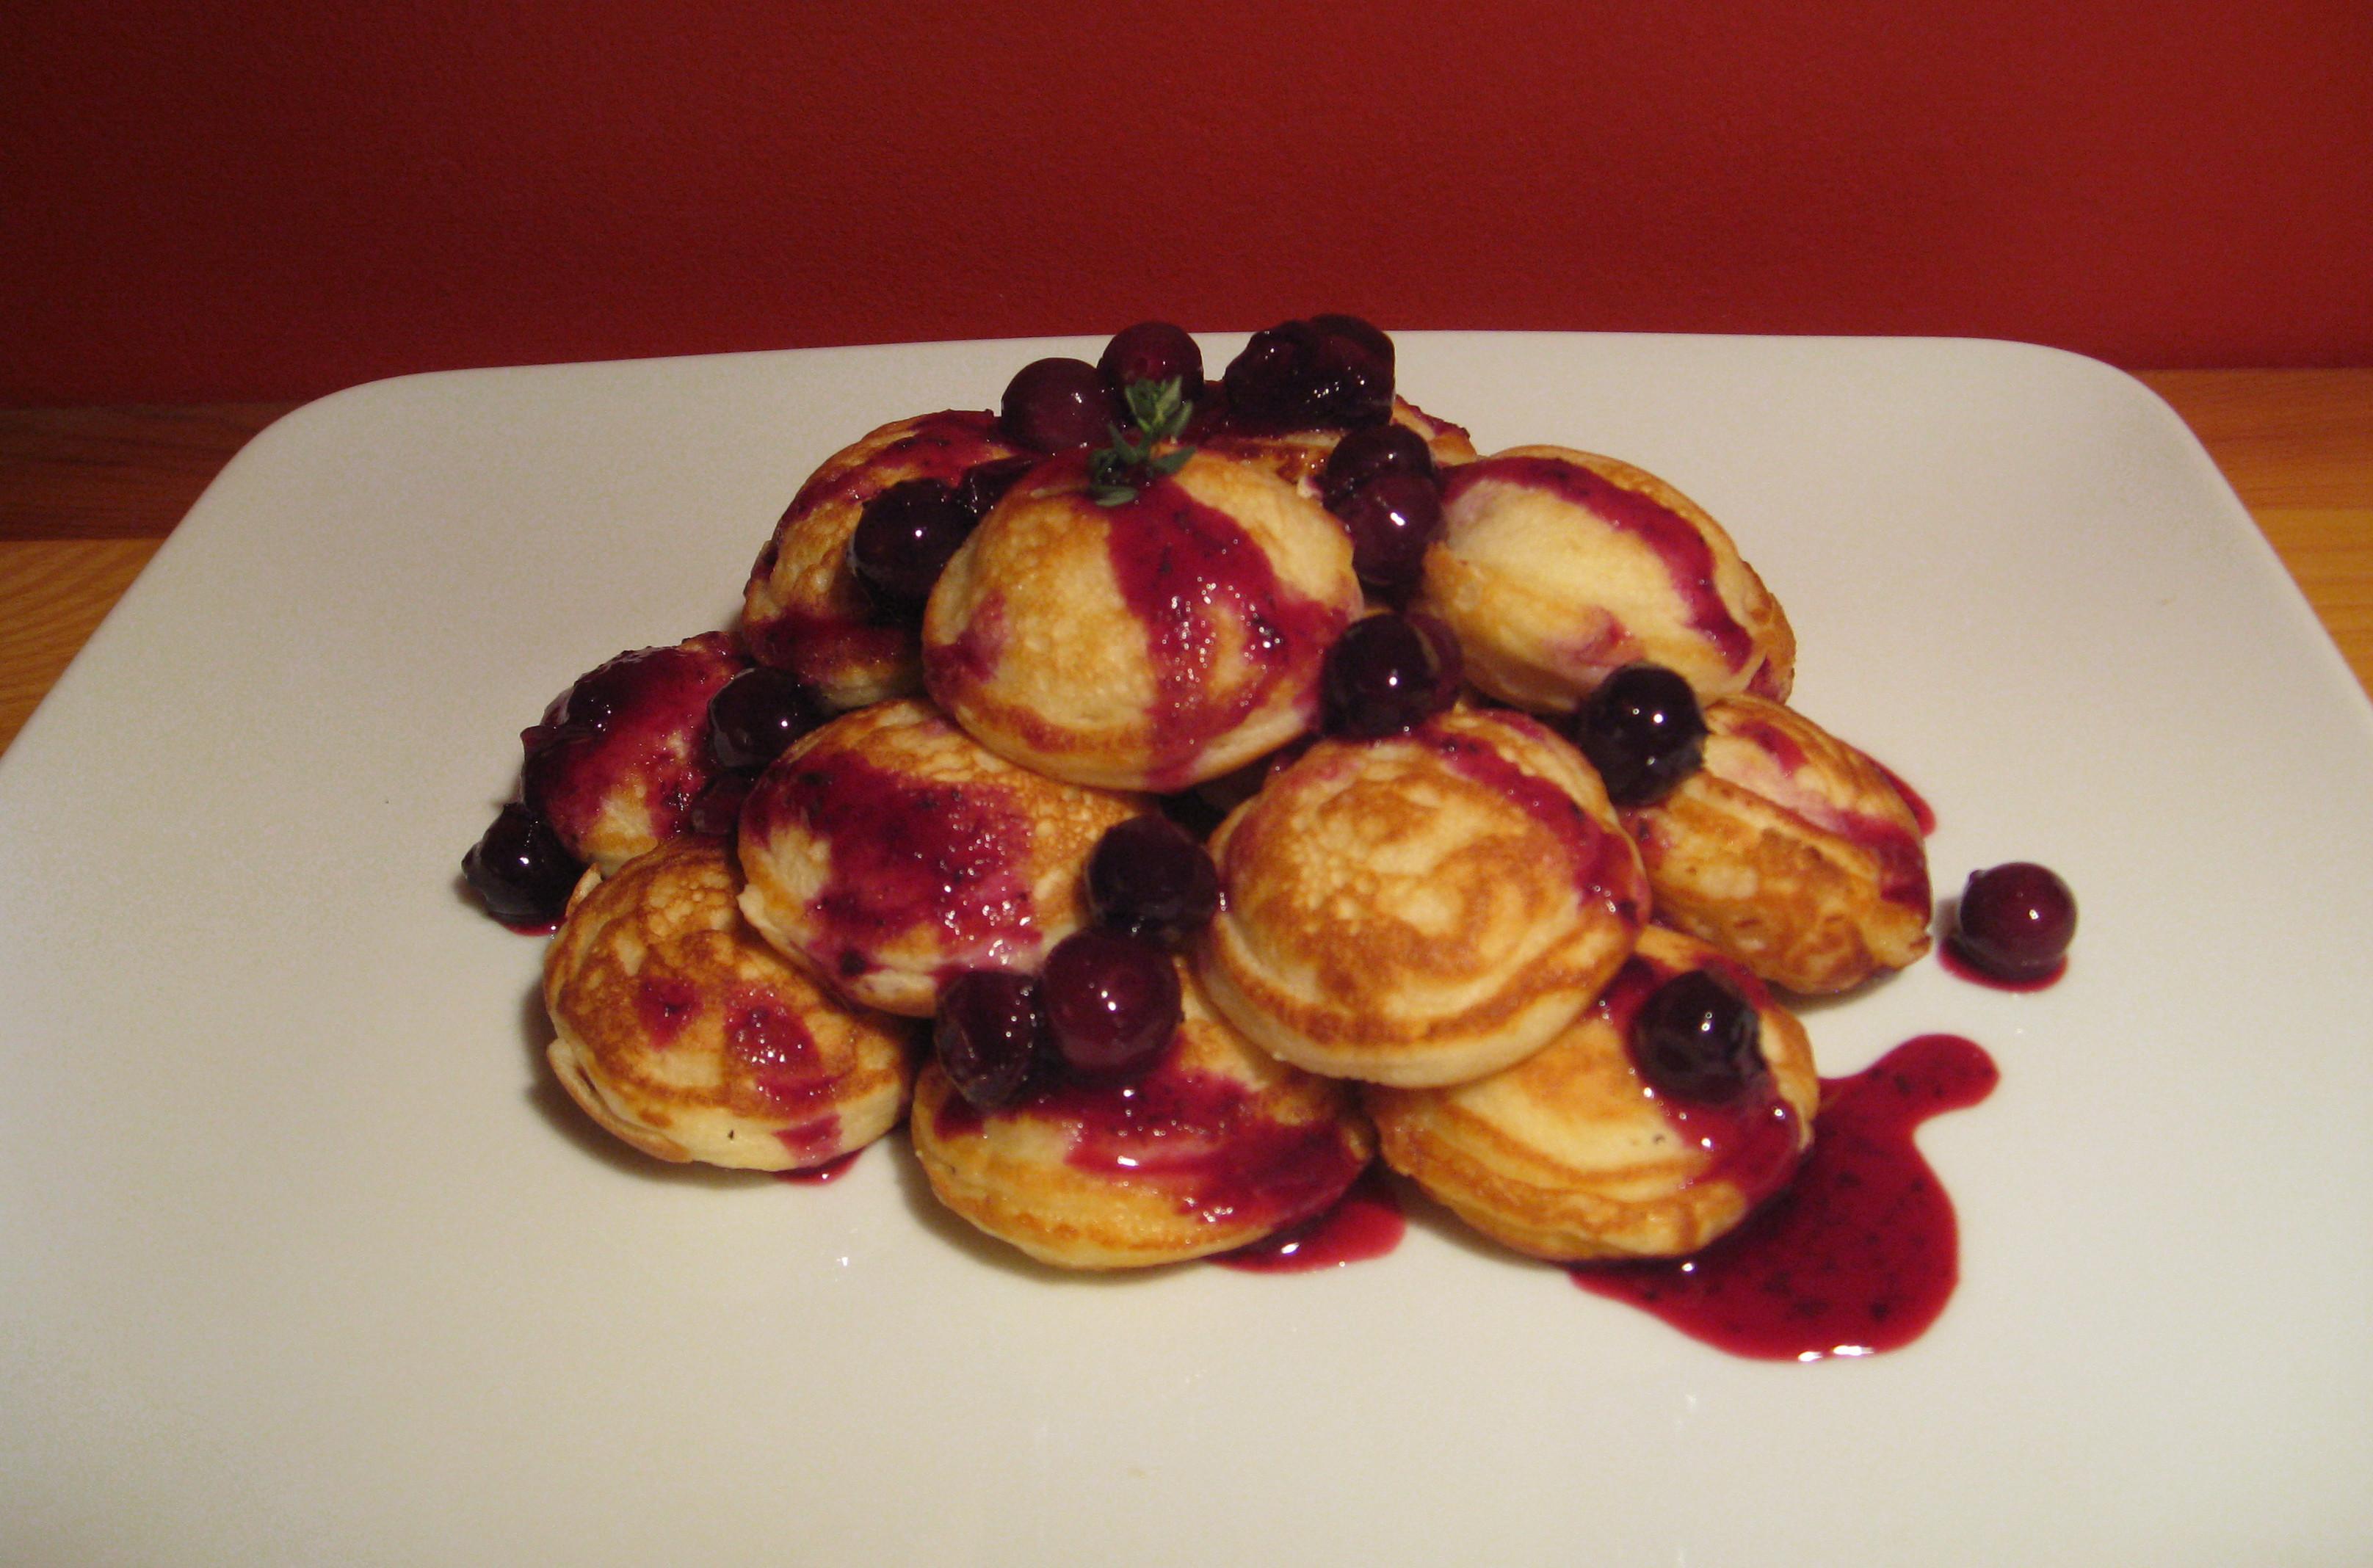 Lemon Mascarpone Stuffed Ebelskivers (Danish Pancakes) with Blueberry Thyme Compote